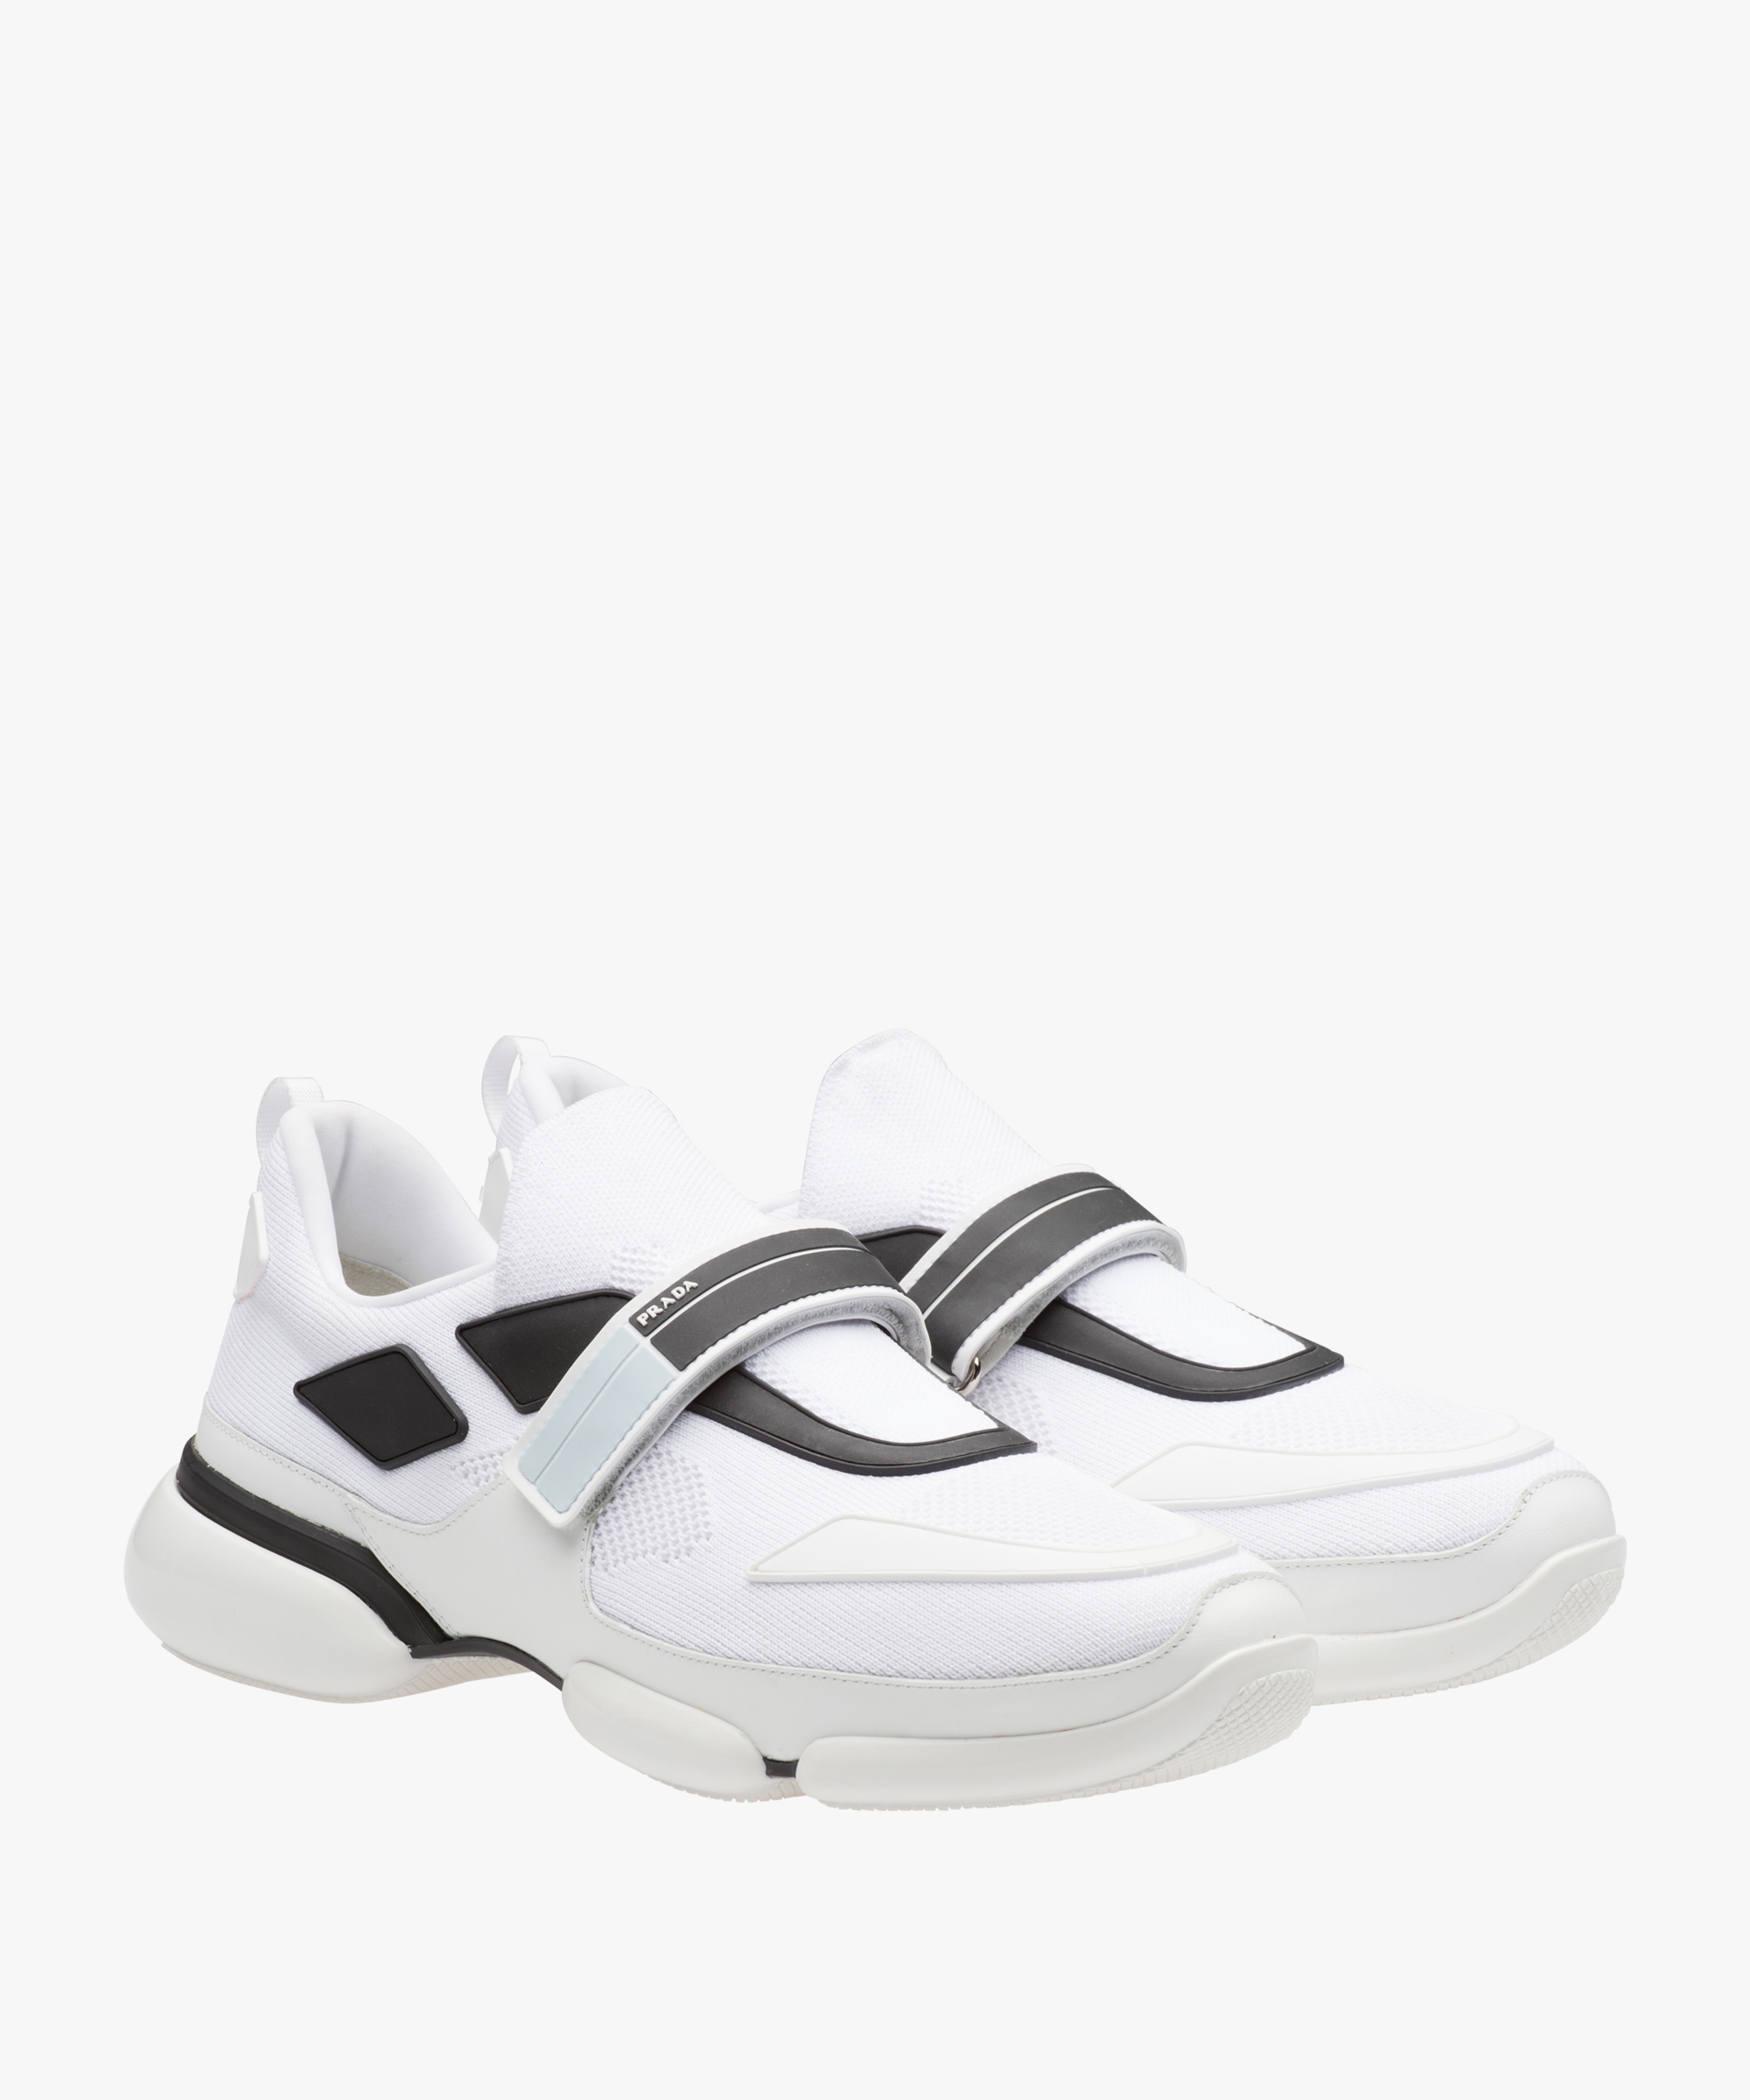 deals cheap online Prada White Cloudbust sneakers best sale cheap online good selling very cheap q19cfEfVUP